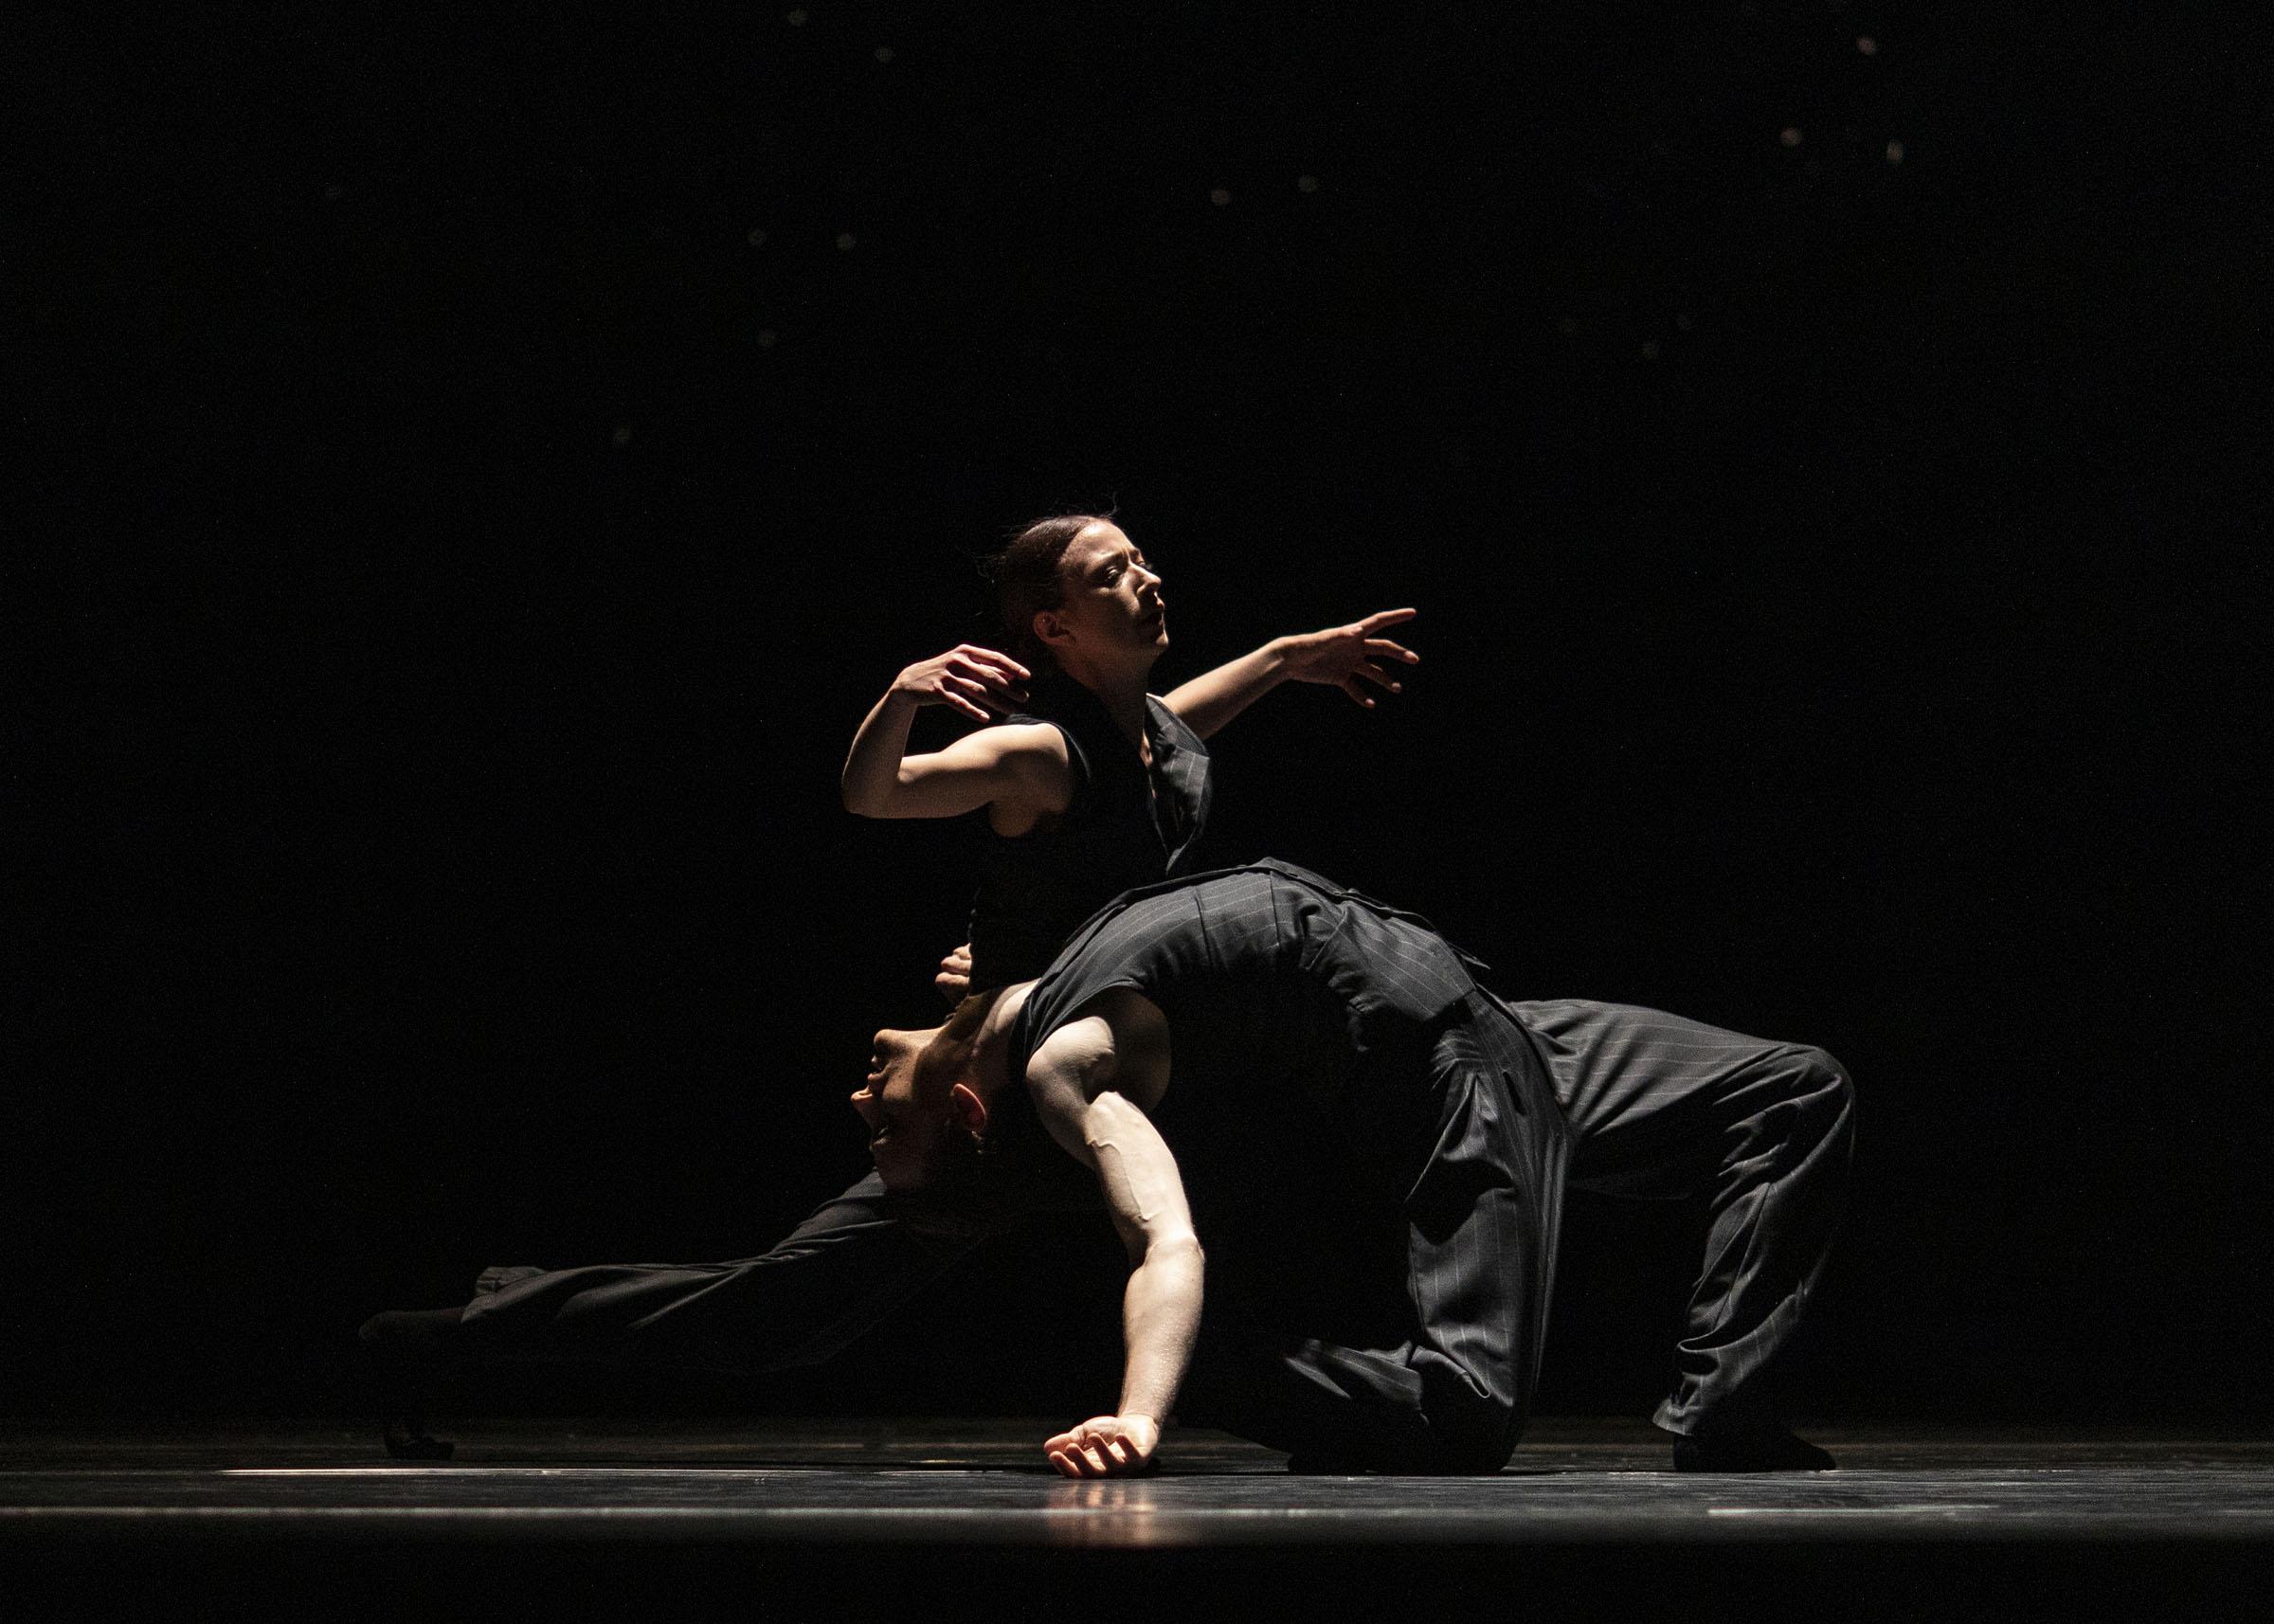 Isabella Gasparini in 'Solo Echo', part of '21st Century Choreographers'